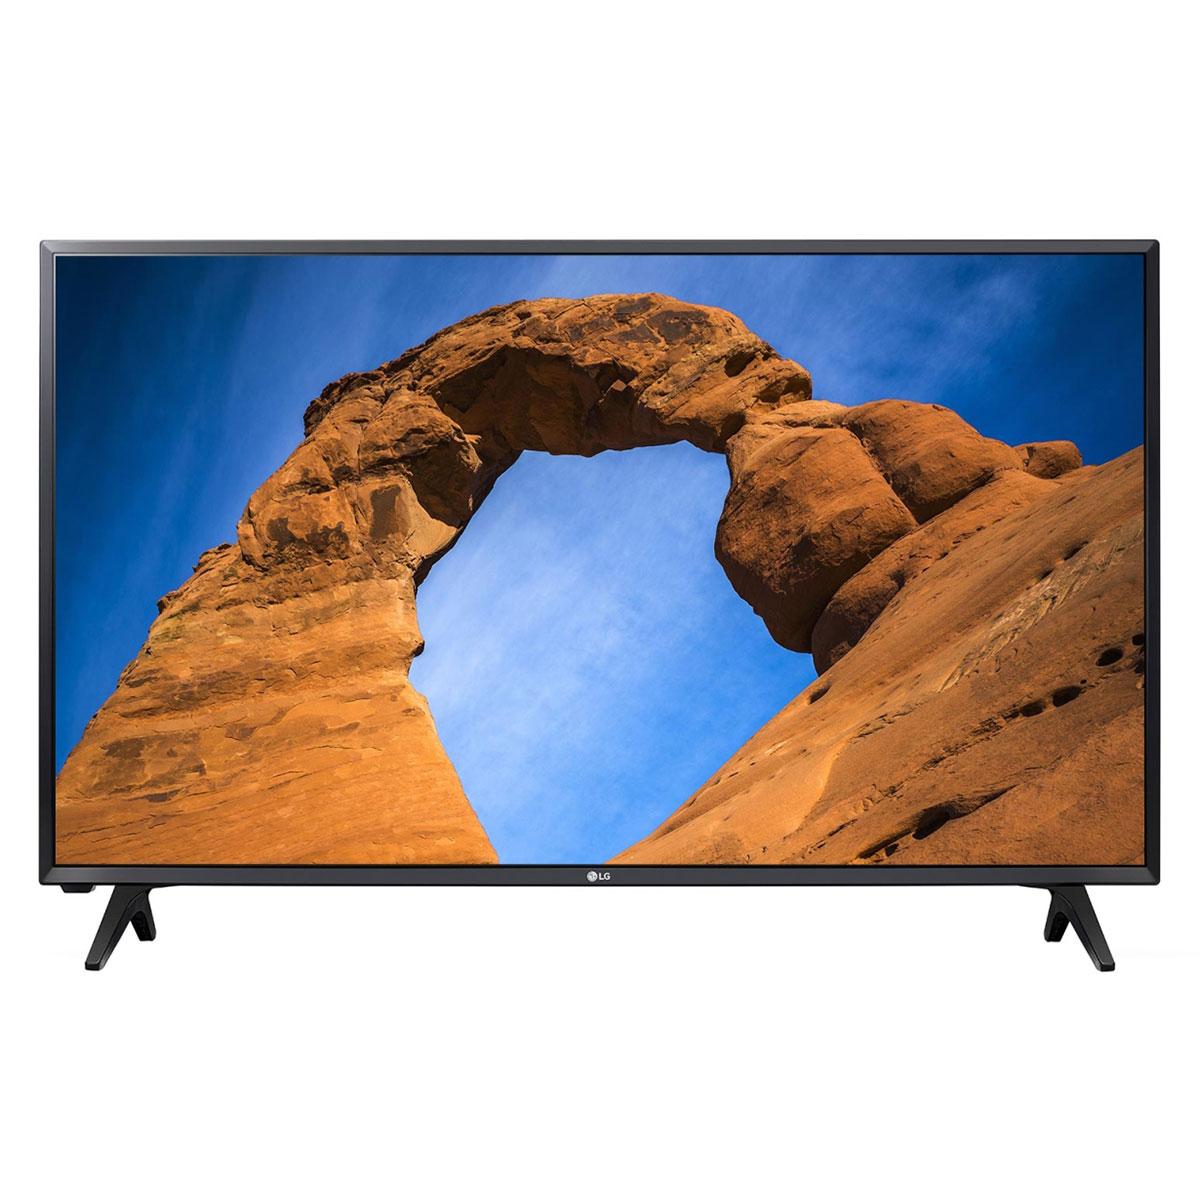 "TV LG 32LK500 Téléviseur LED HD 32"" (81 cm) 16/9 - 1366 x 768 pixels - HDTV - 200 Hz"